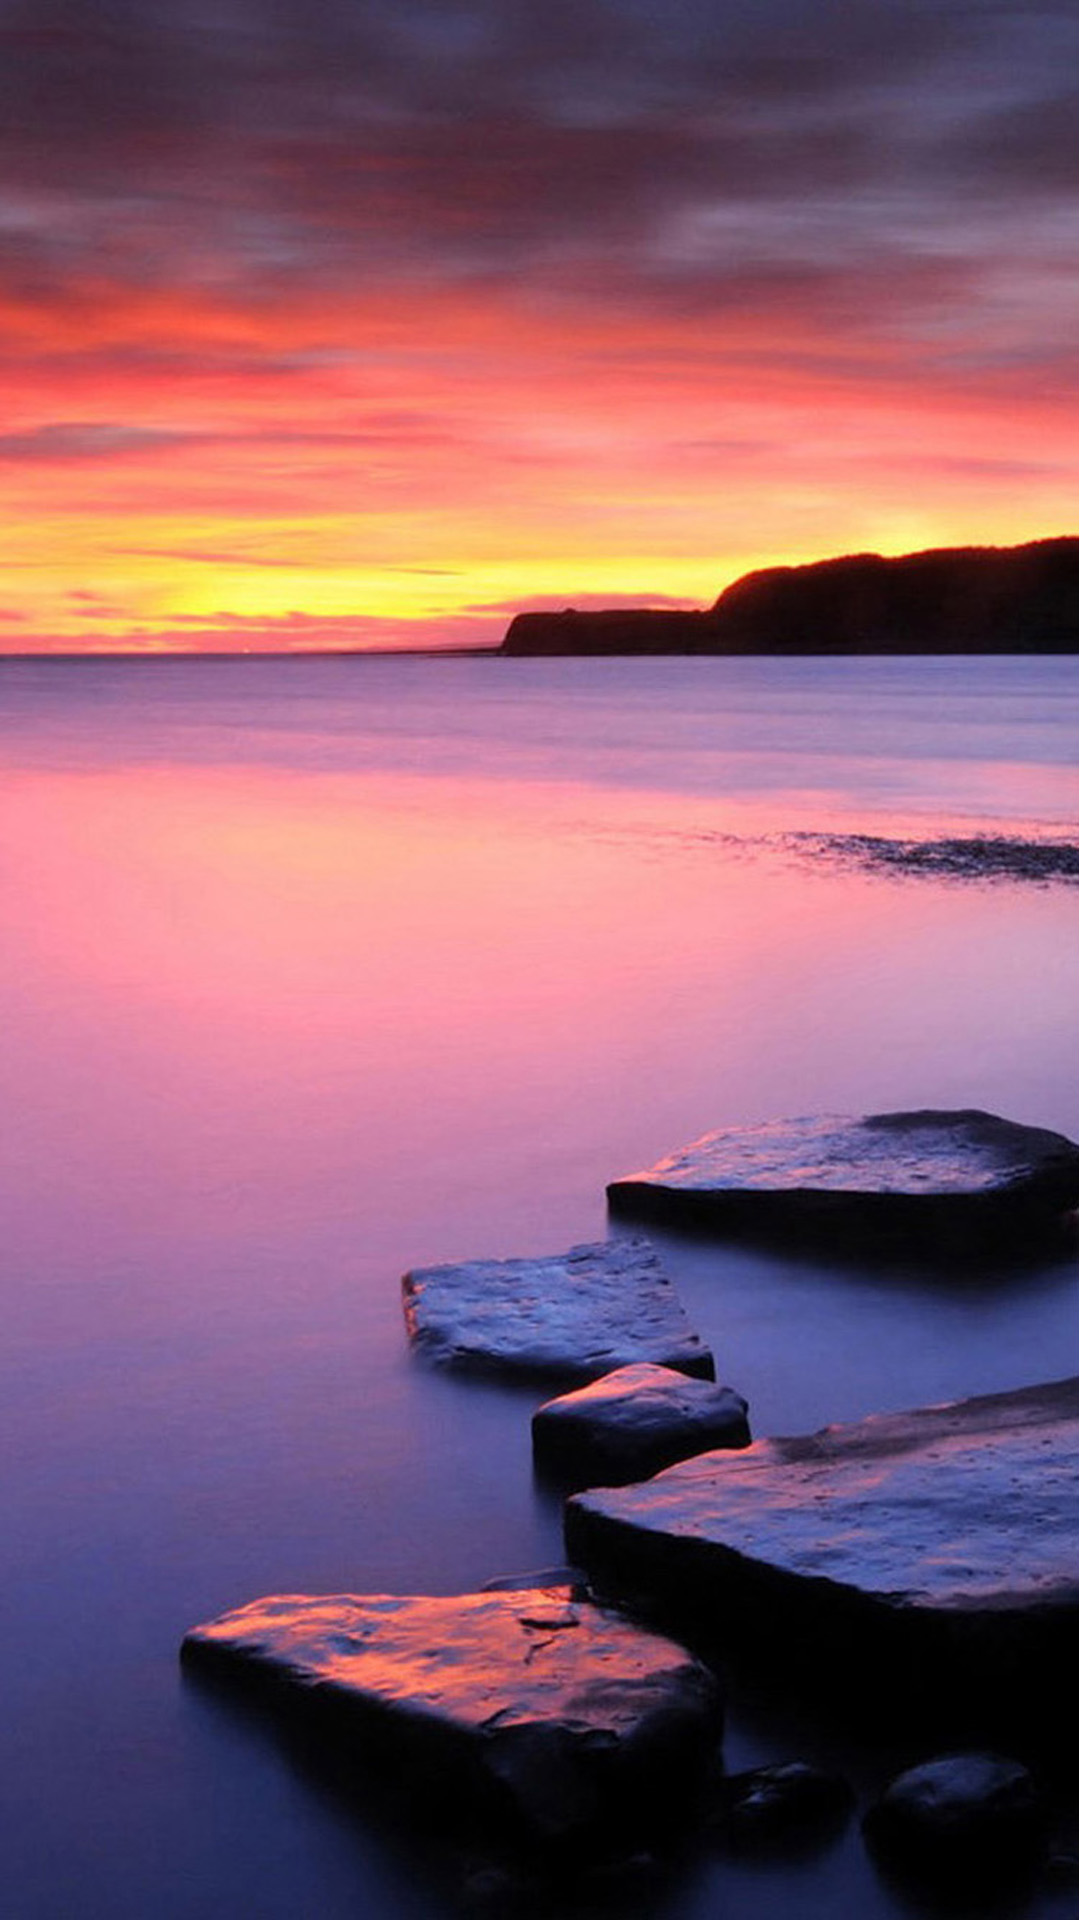 Sunset On Beach With Rocks Android Wallpaper Calming Wallpaper Iphone 1080x1920 Wallpaper Teahub Io Wallpaper rocks sea houses sunset sky